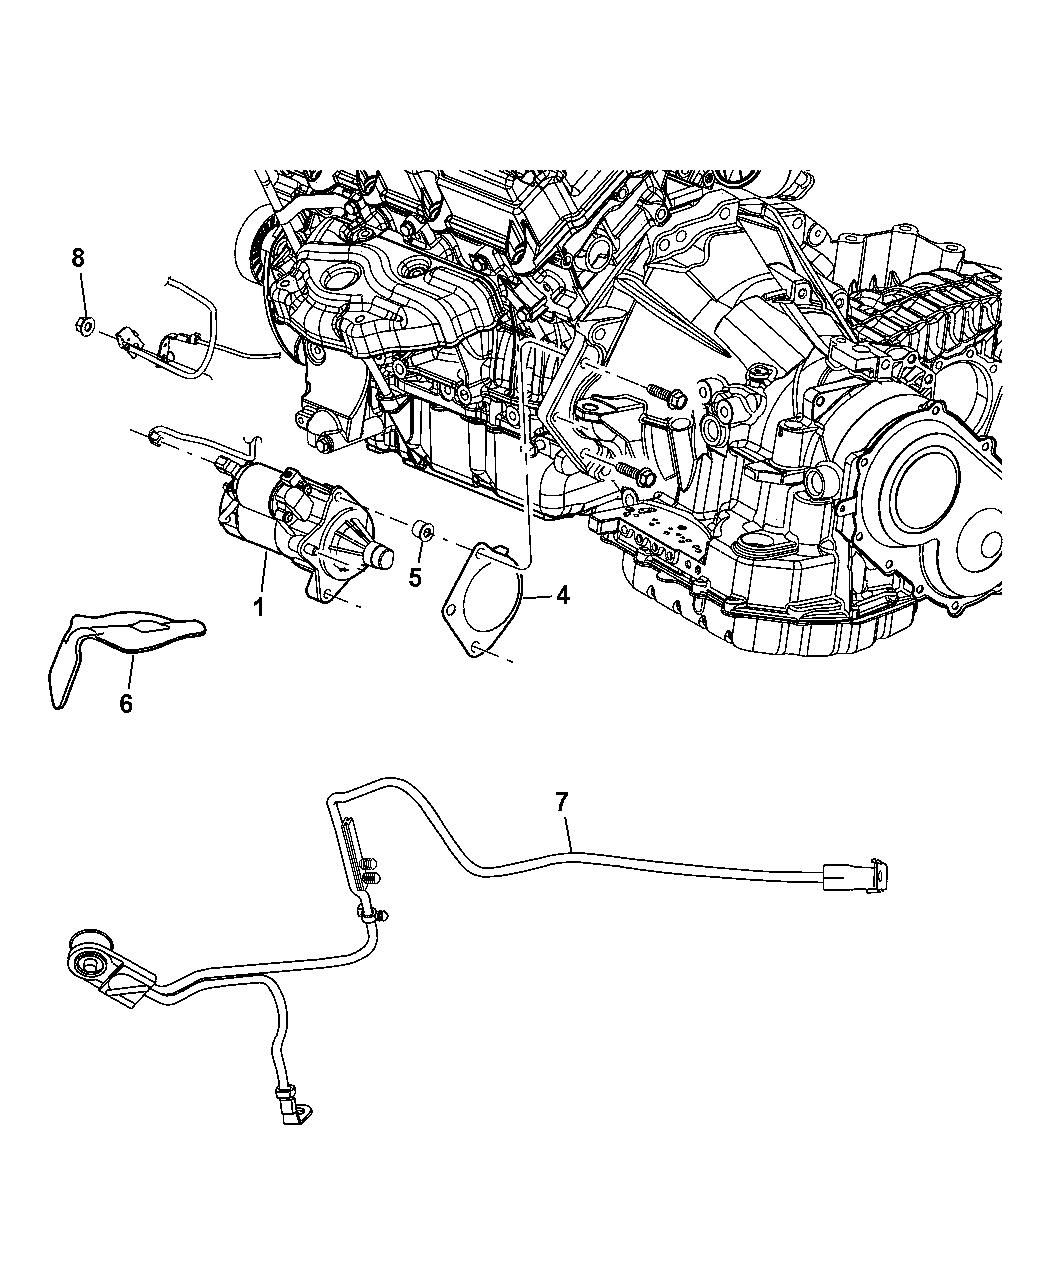 chrysler sebring 2 7 engine diagram - wiring diagrams wall-tunnel-a -  wall-tunnel-a.alcuoredeldiabete.it  al cuore del diabete